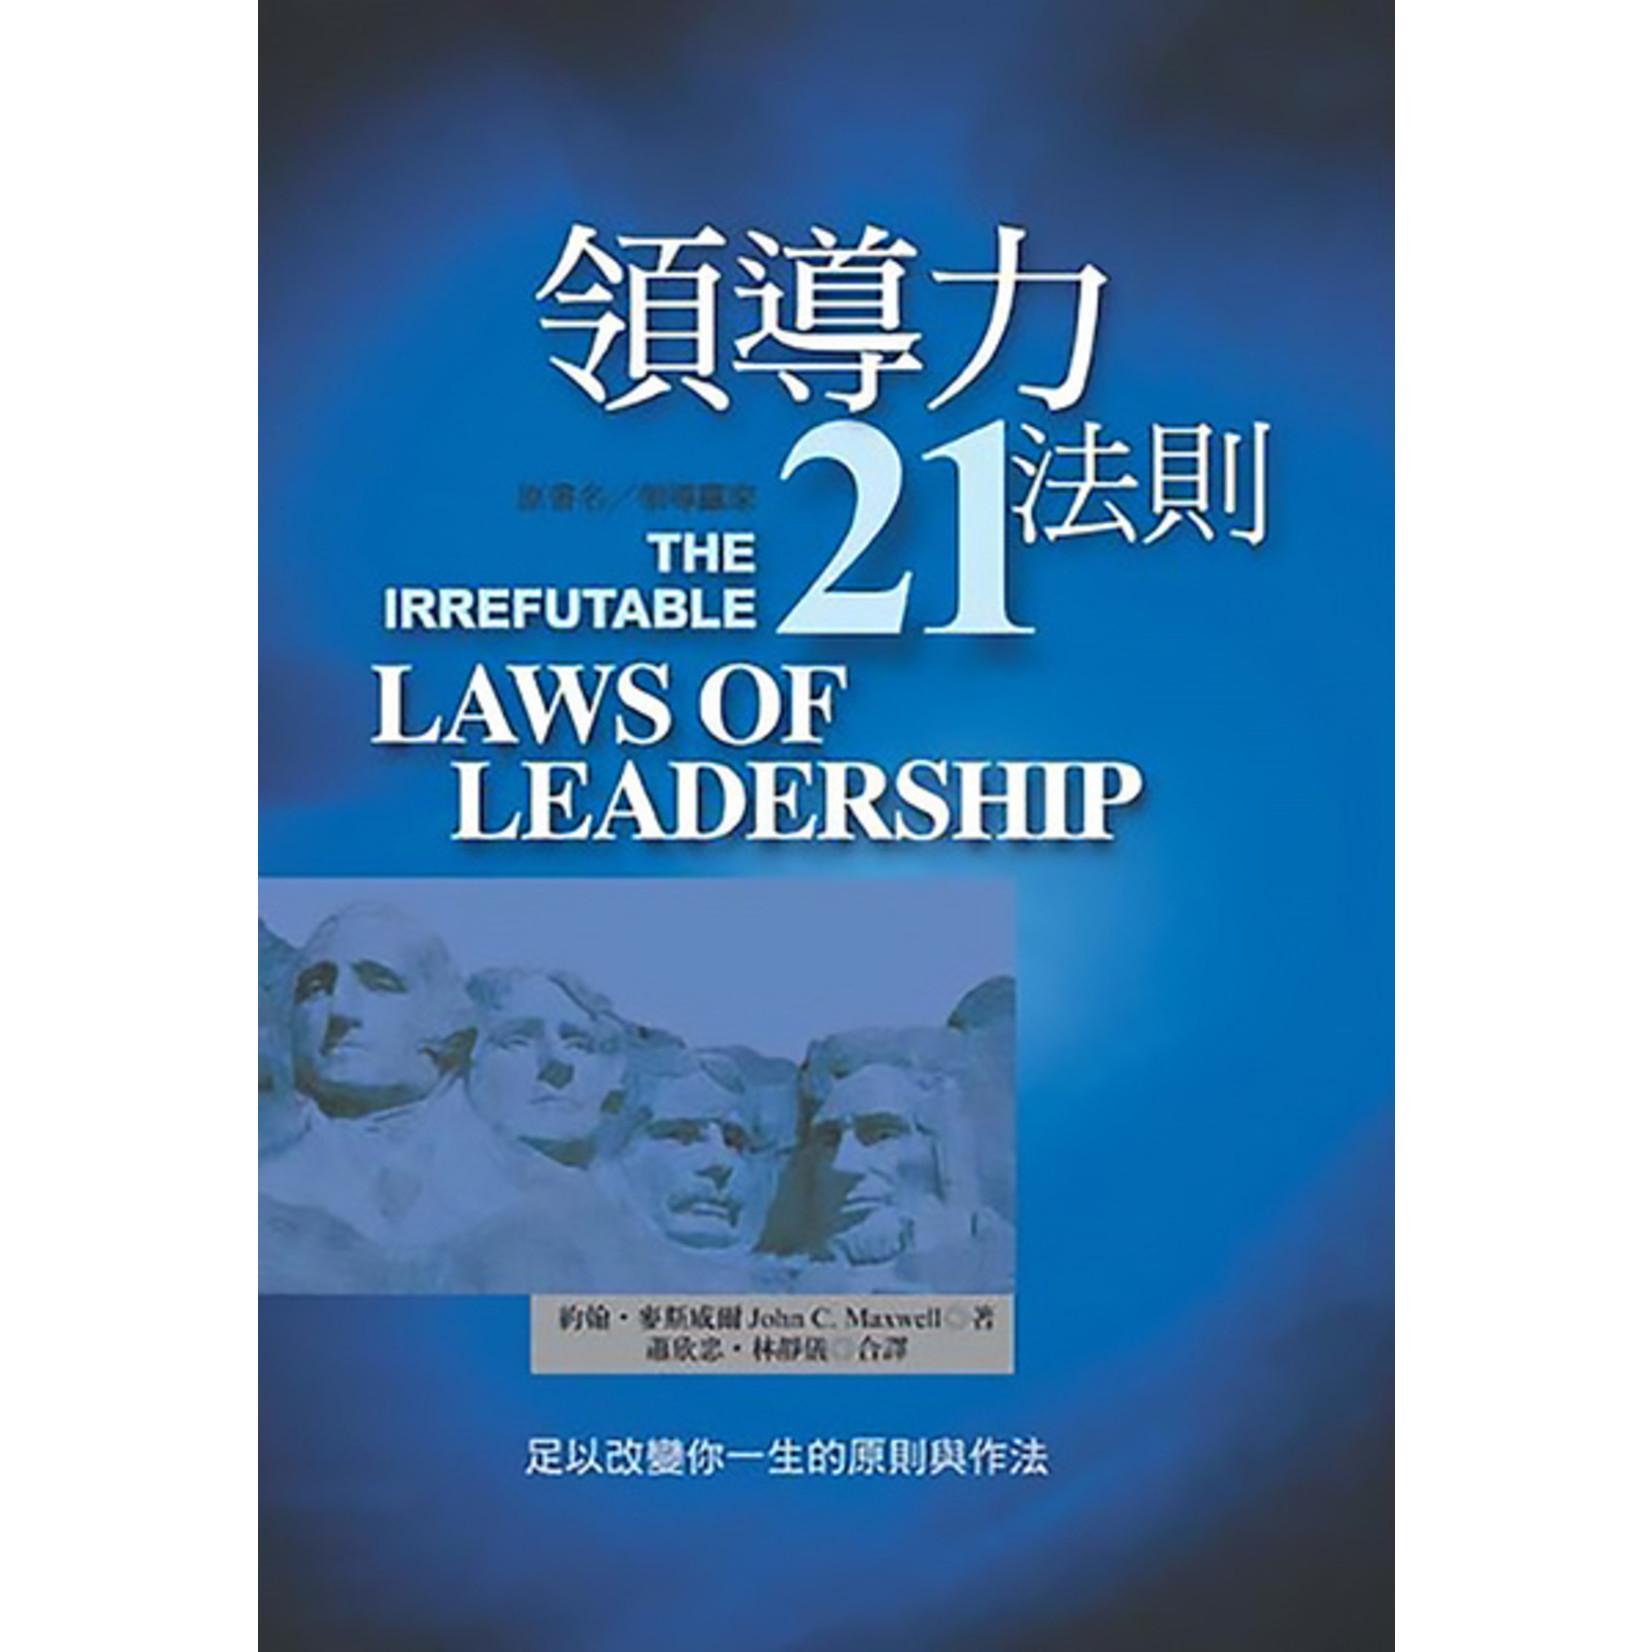 基石 SOW 領導力21法則:足以改變你一生的原則與作法 The 21 Irrefutable Laws of Leadership